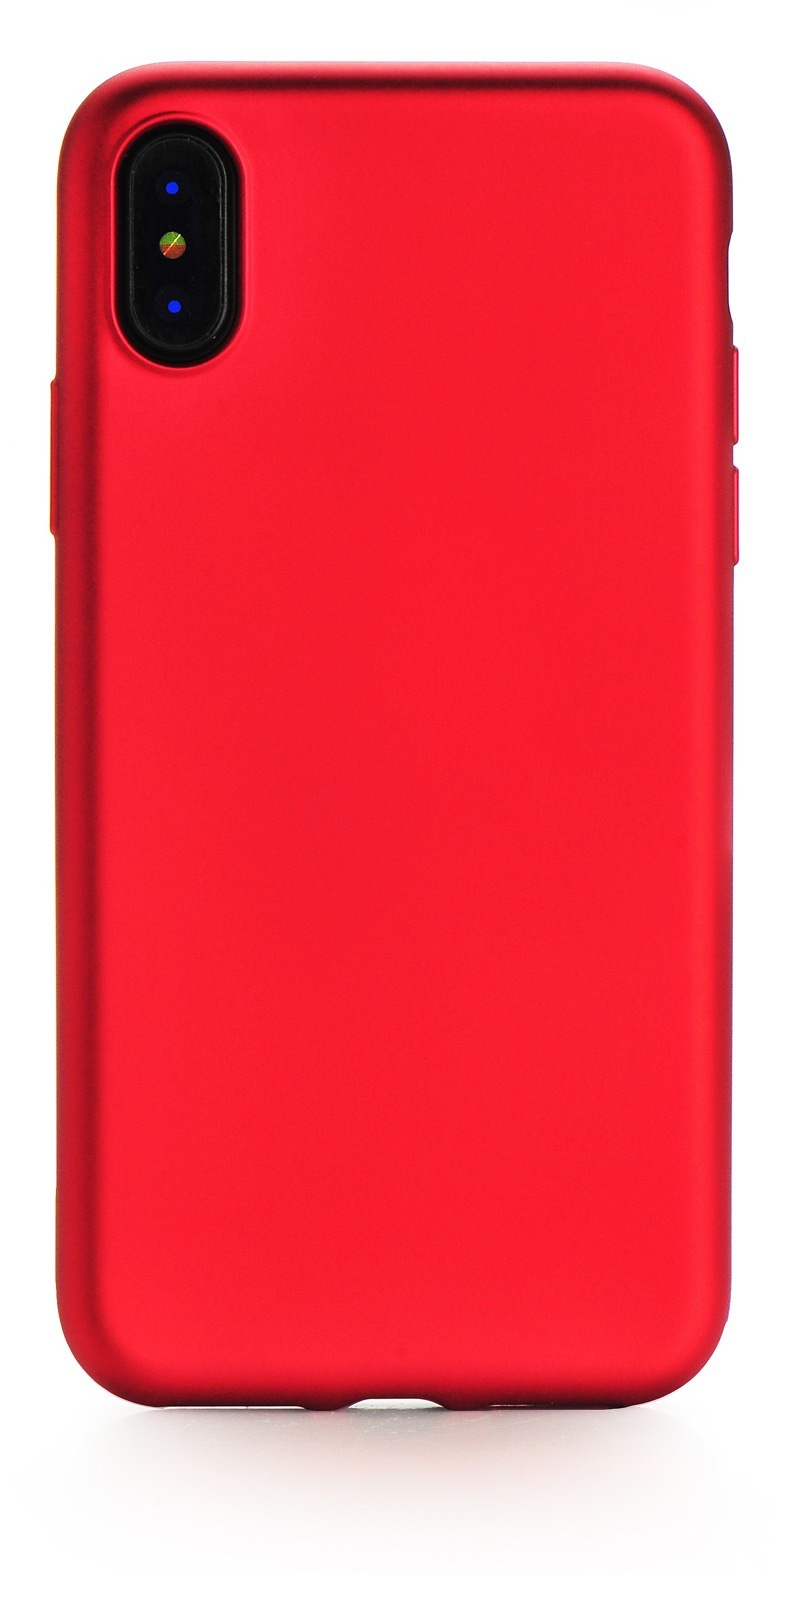 "Чехол для сотового телефона Gurdini накладка силикон Soft Touch 905088 для Apple iPhone X/XS 5.8"", красный"